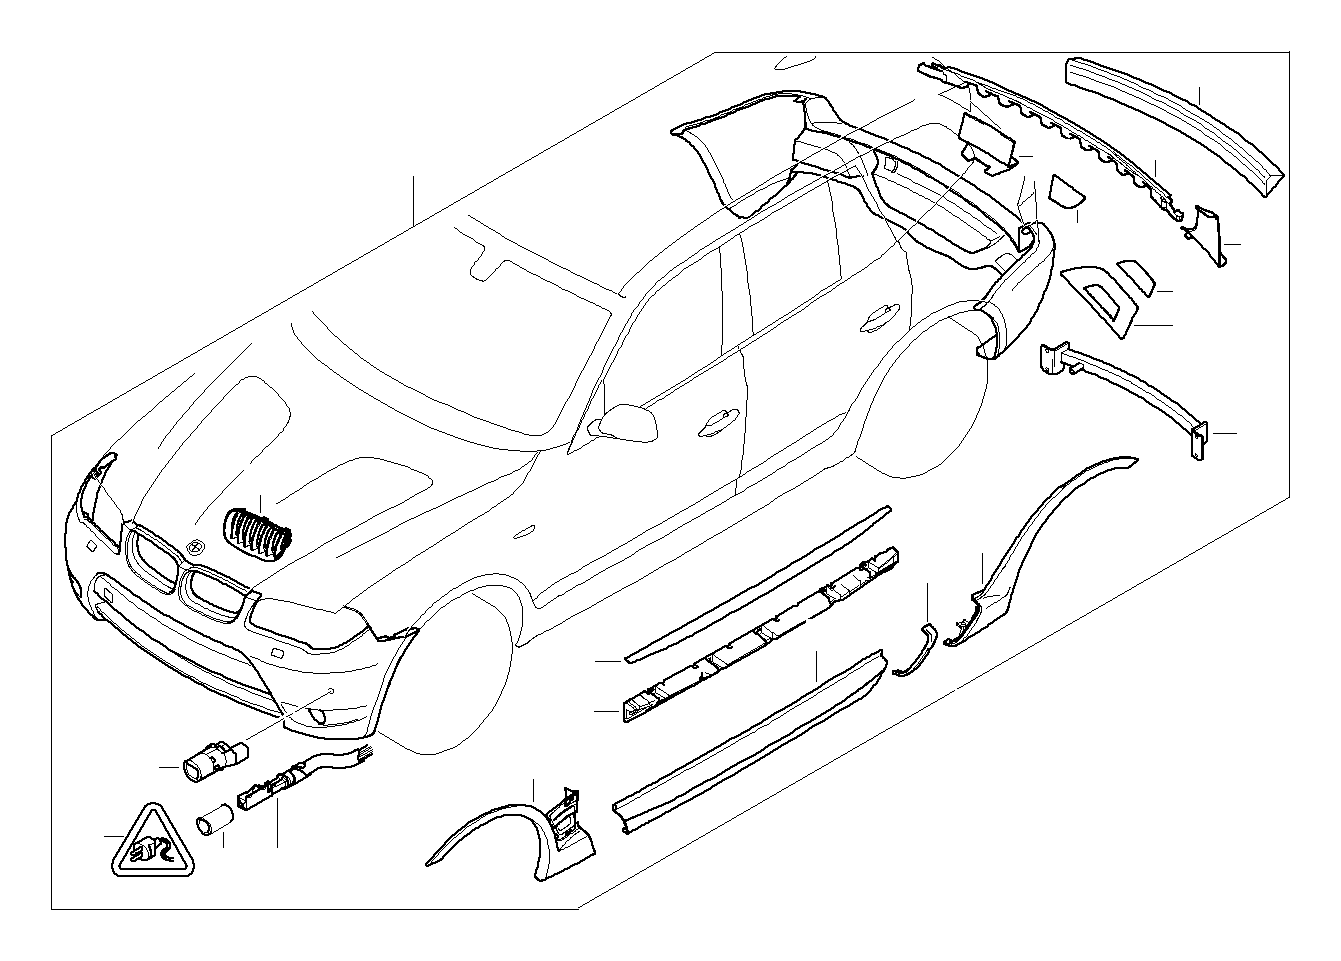 BMW 530i Ultrasonic-sensor. SCHWARZ. Package, Exterior